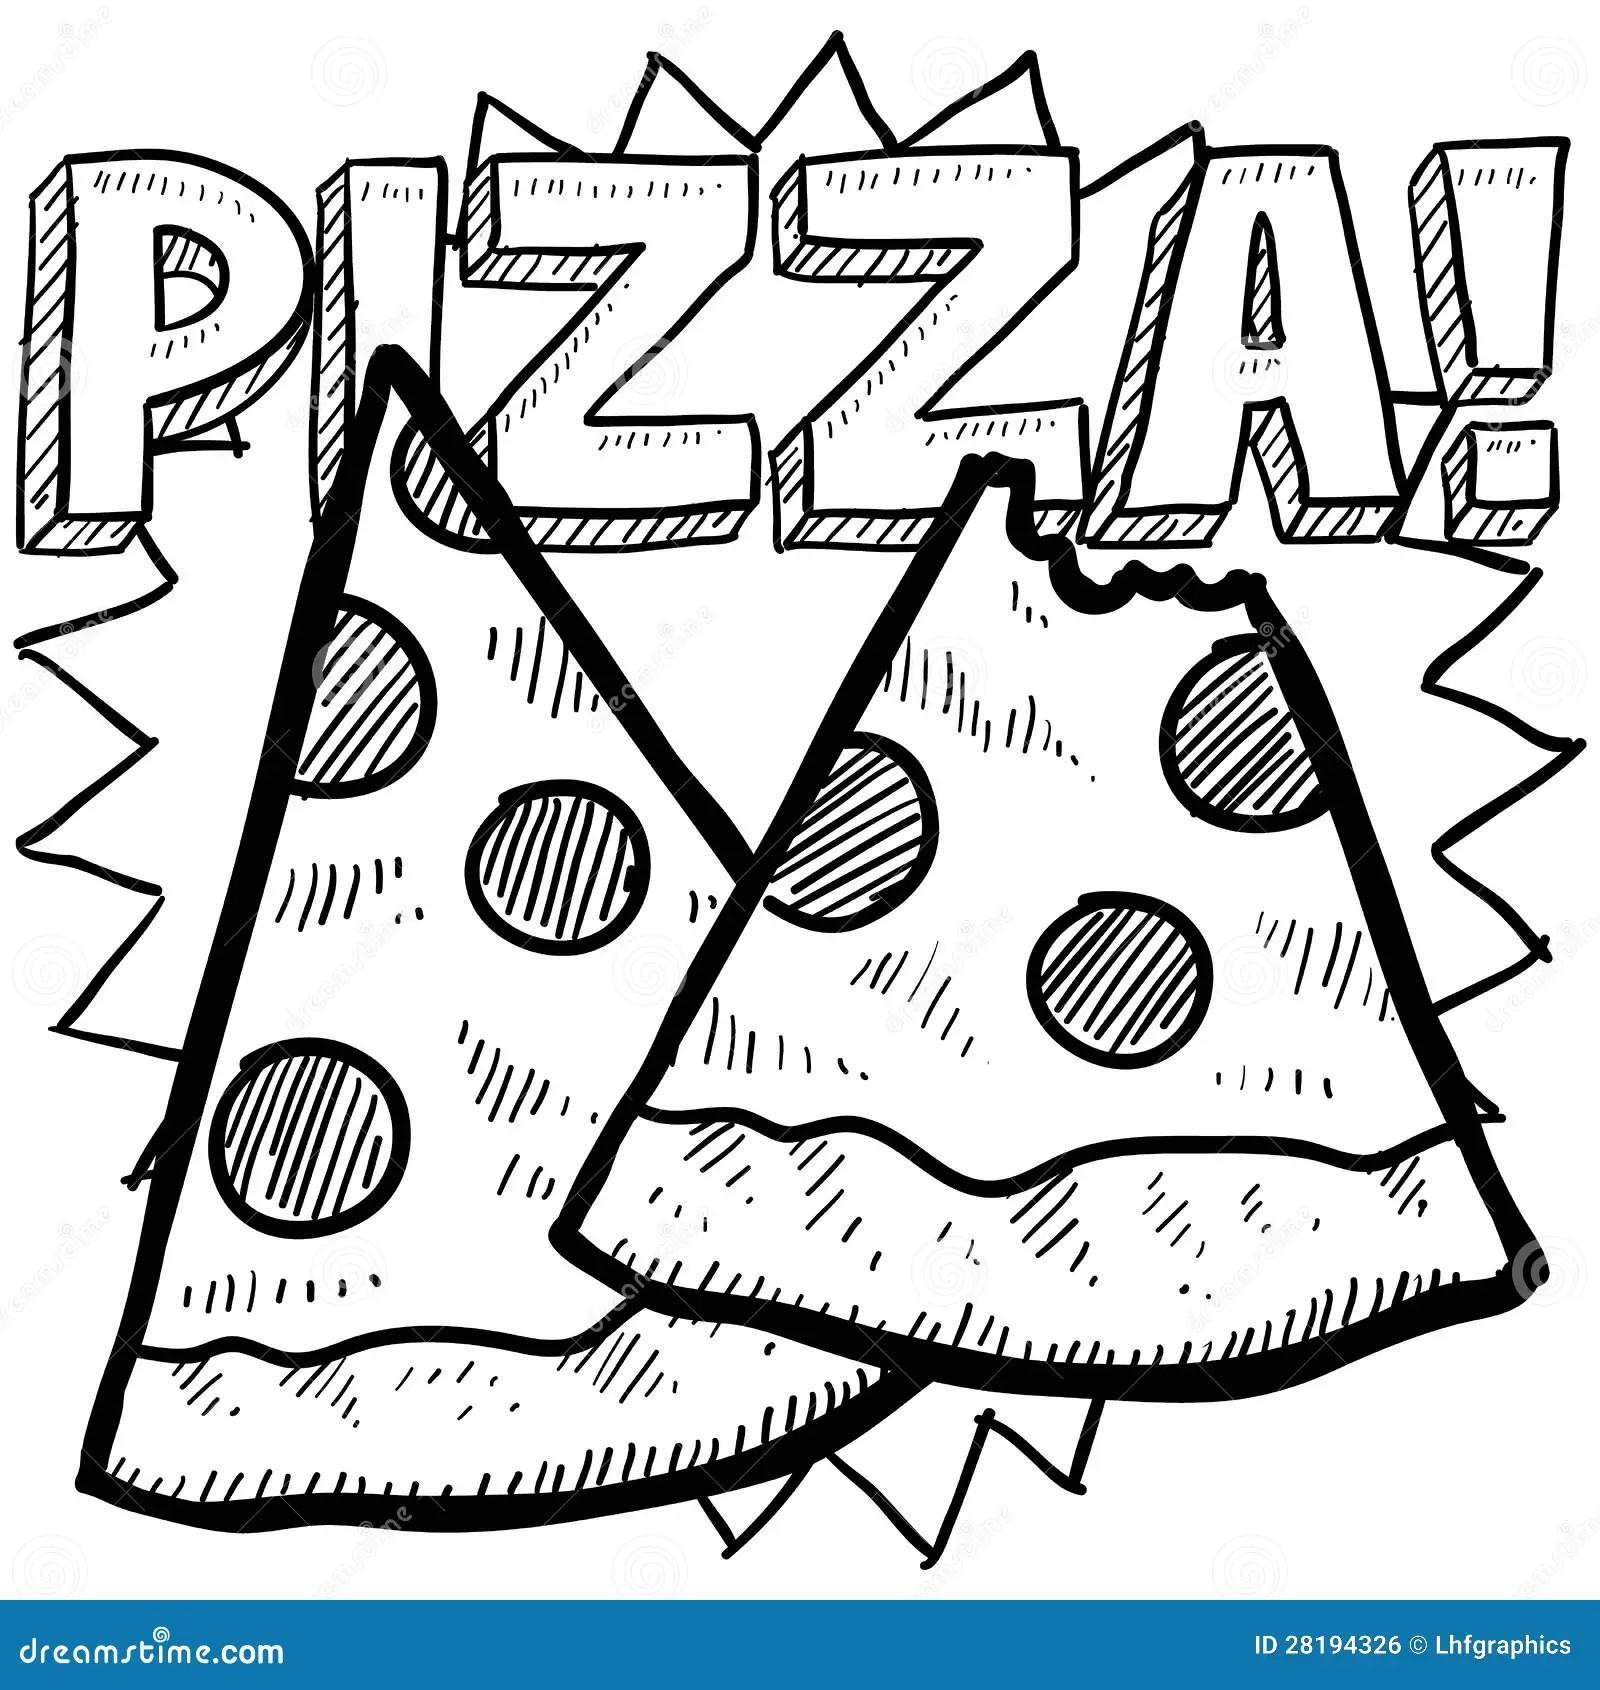 Pizza Slice Sketch Royalty Free Stock Image